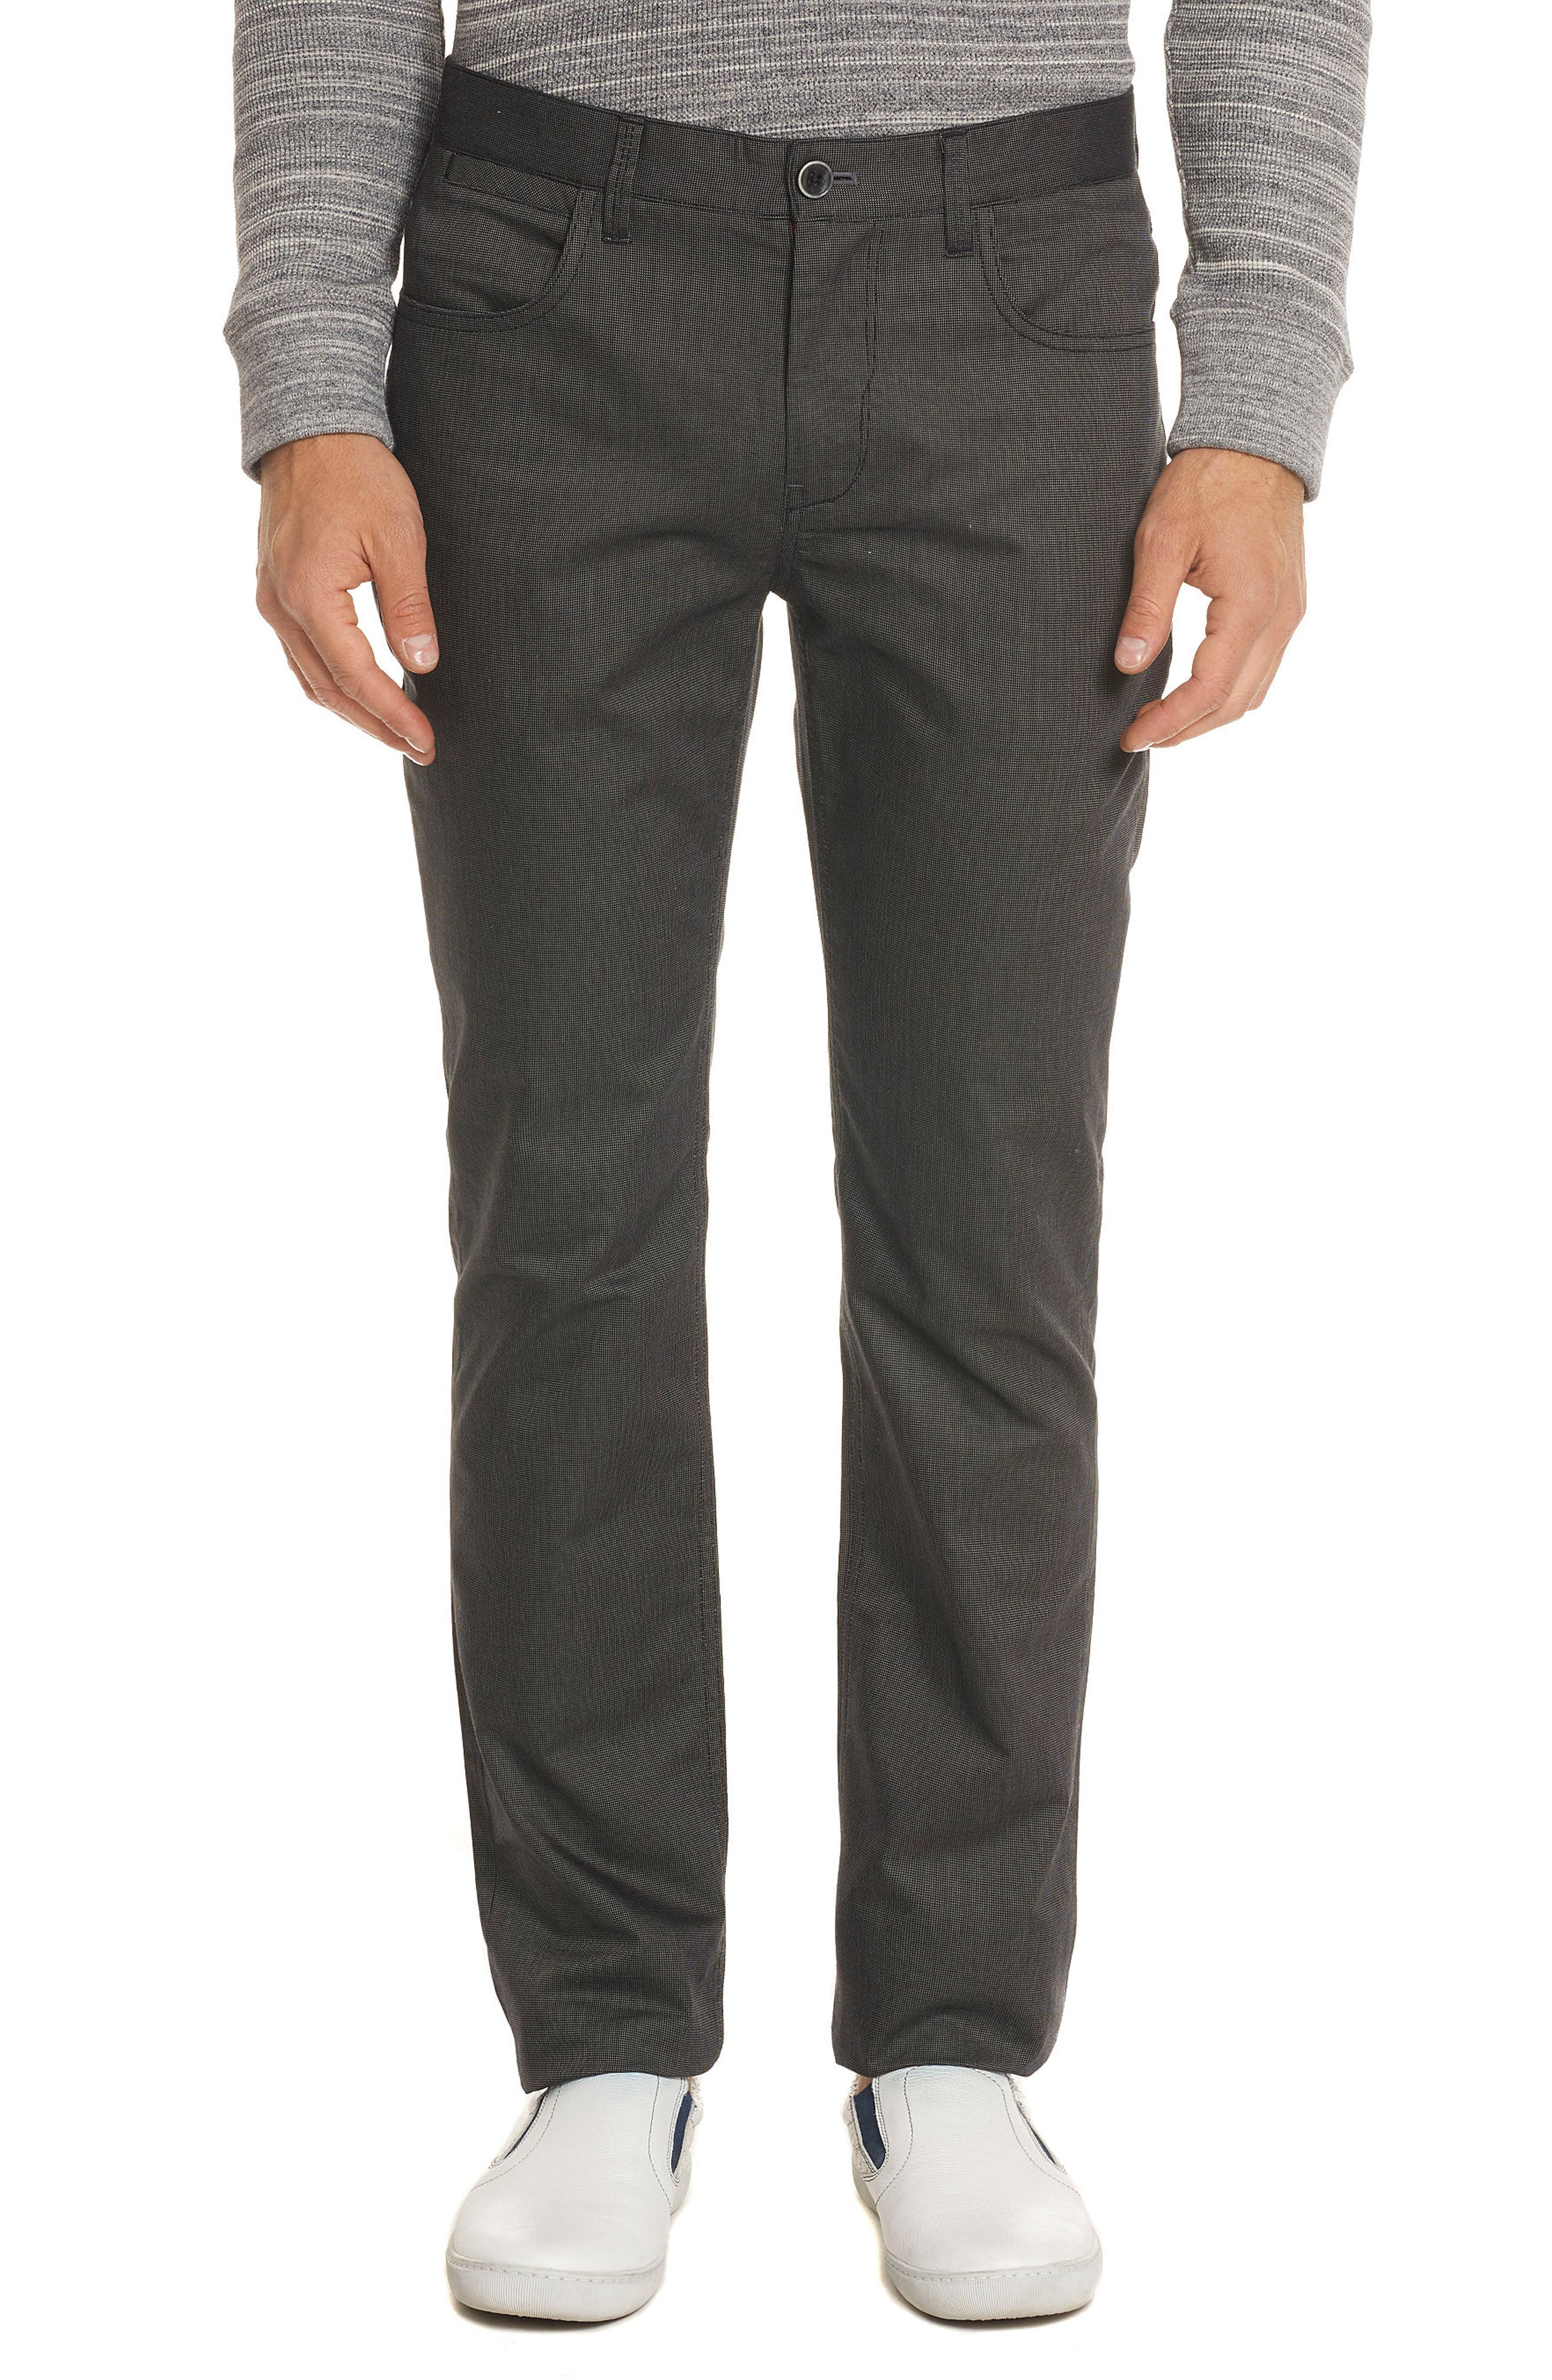 Main Image - Robert Graham Prio Tailored Fit Pants